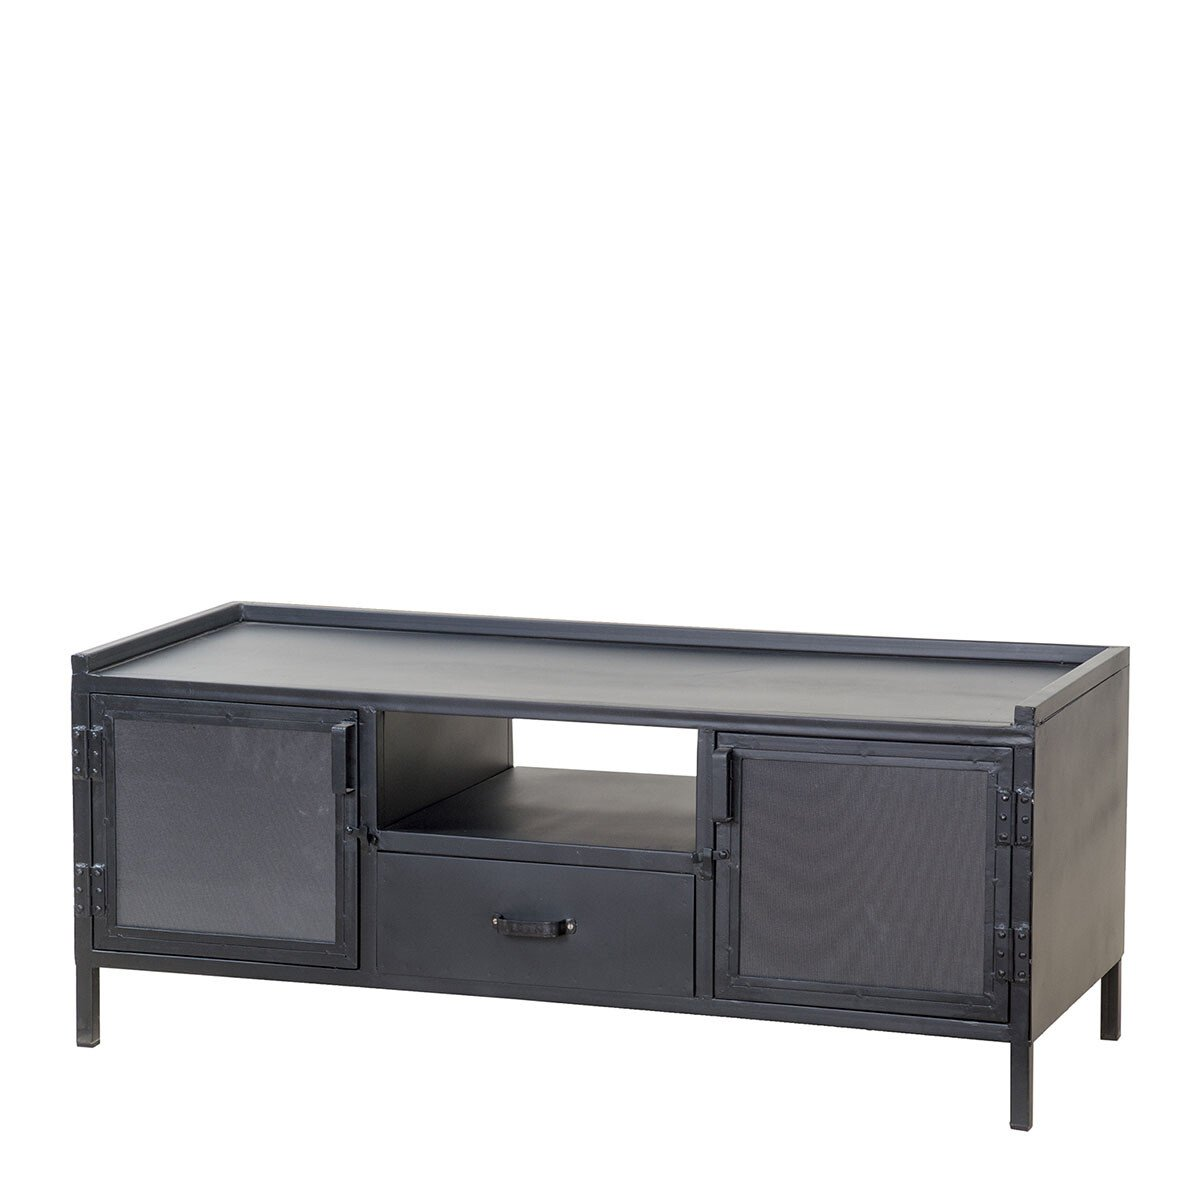 Eleonora TV meubel Industrieel 50 x 130 x 50